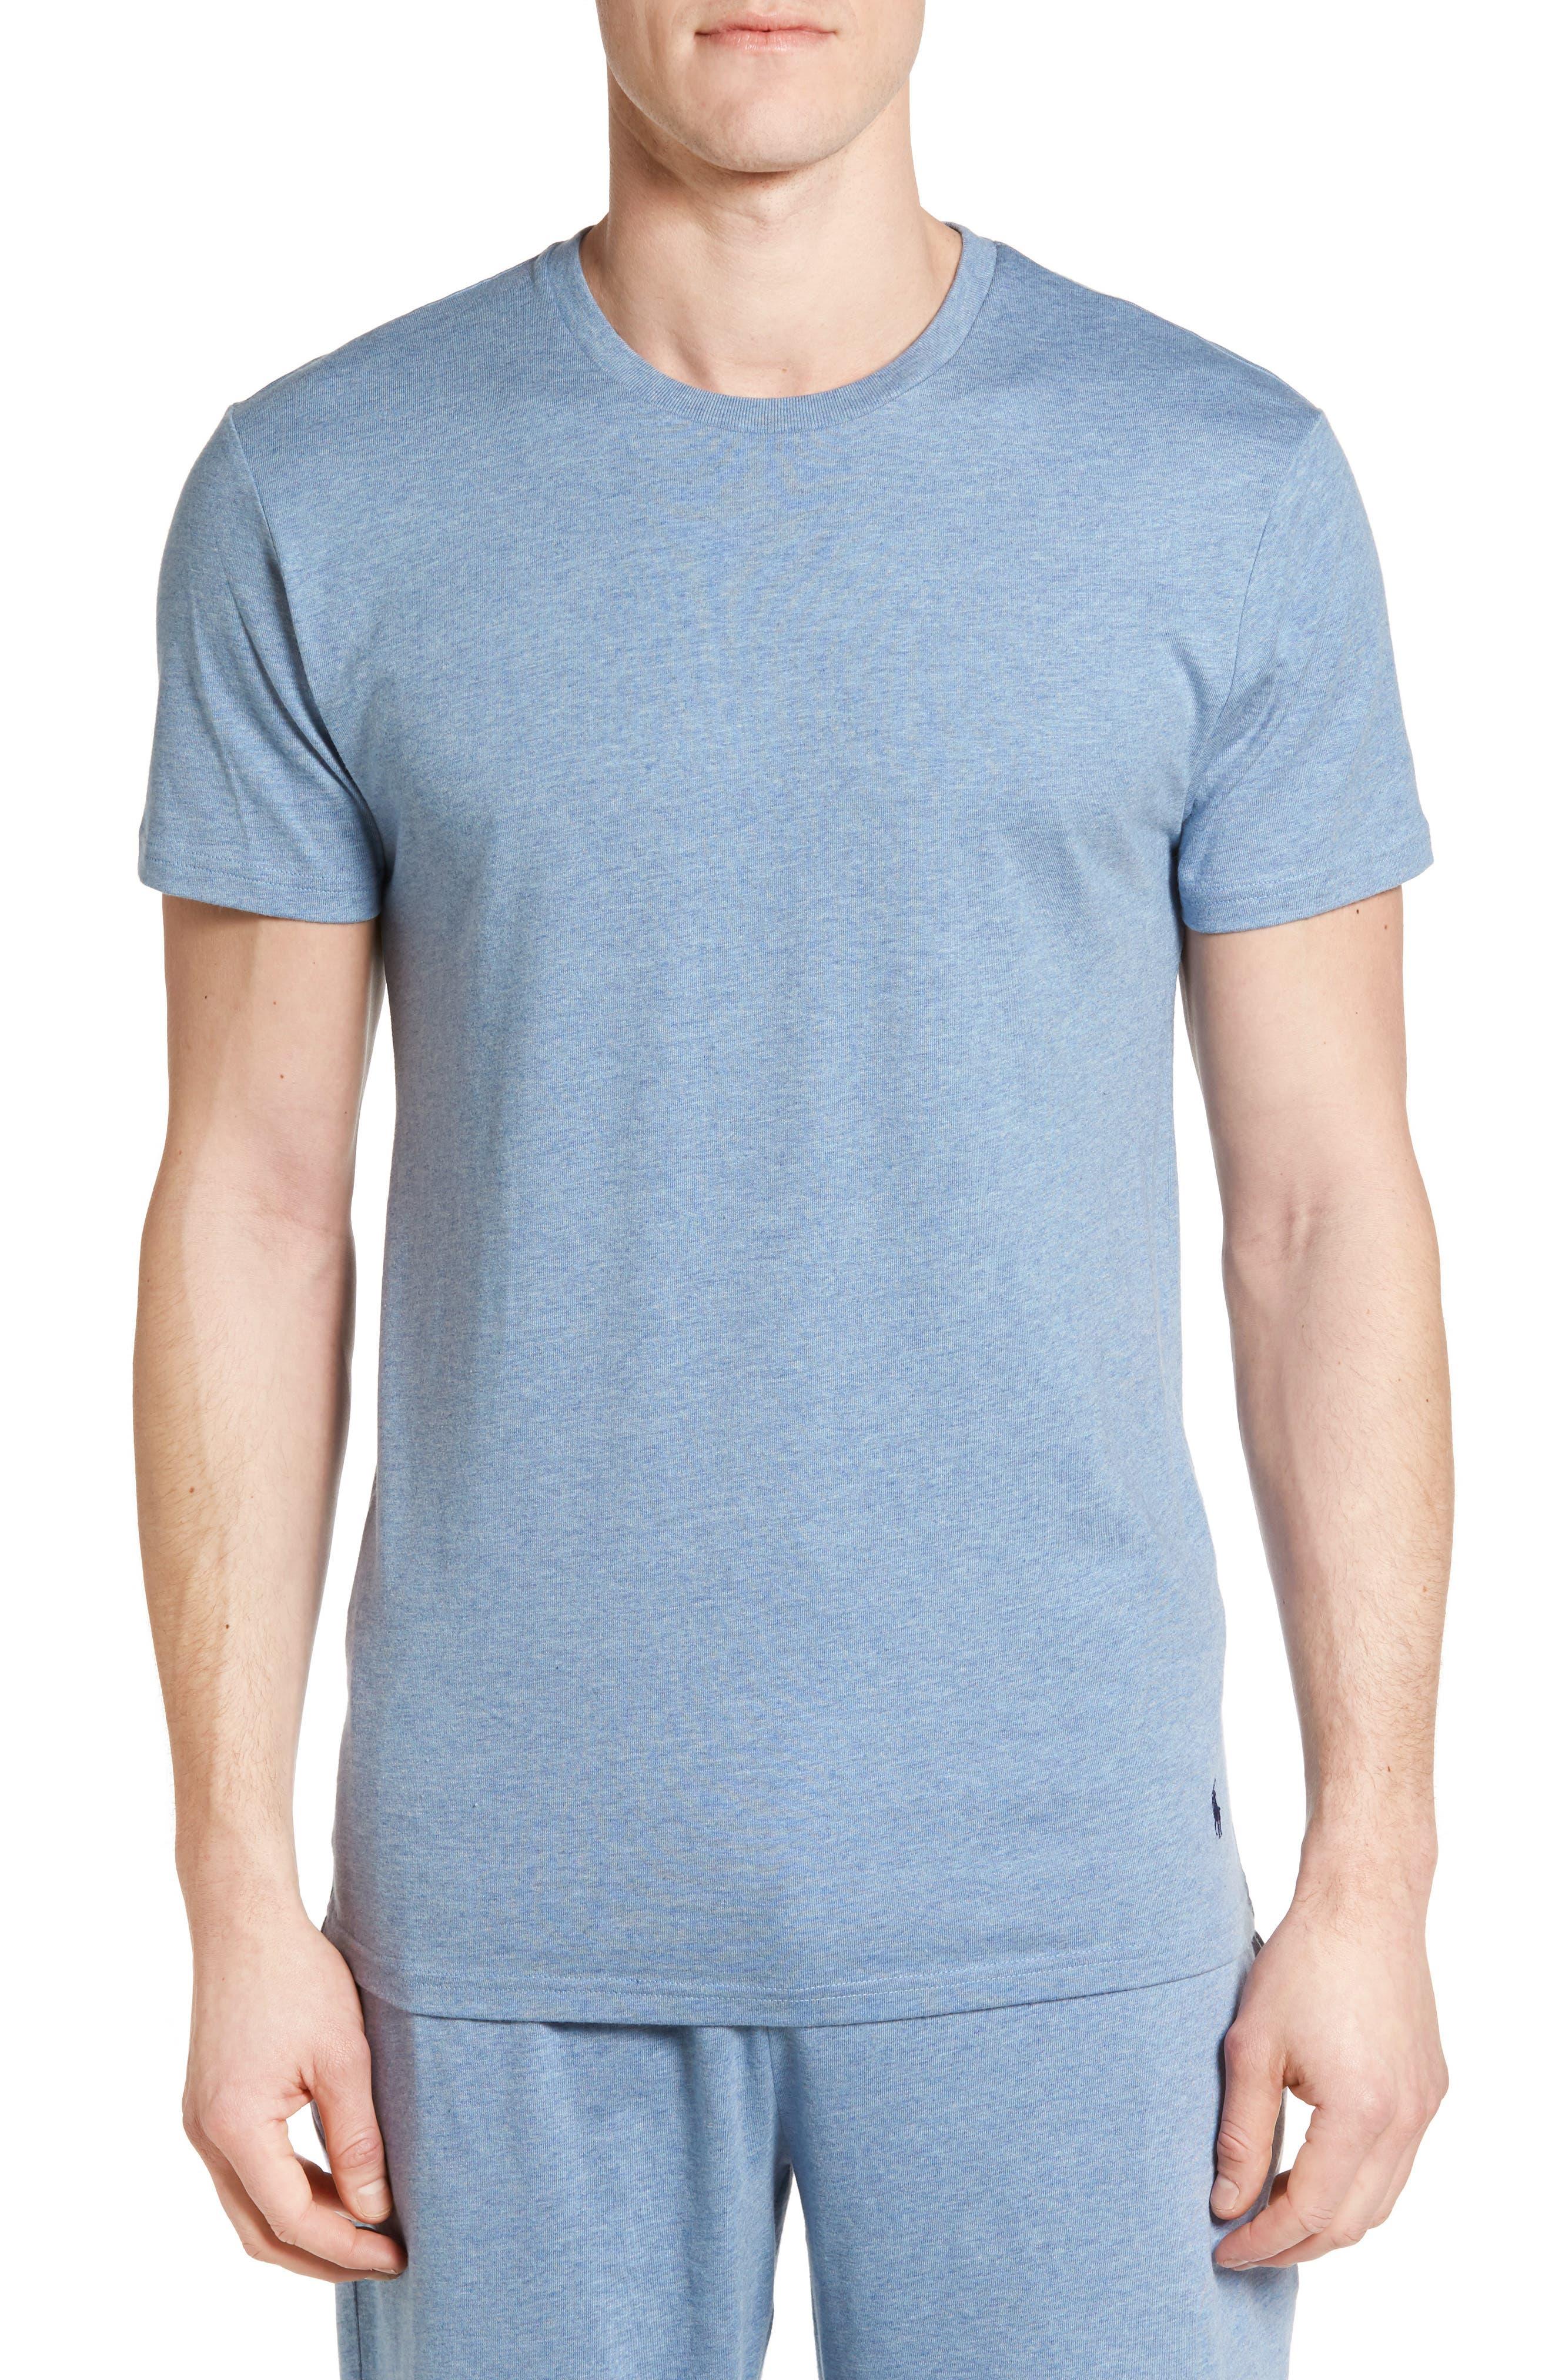 POLO RALPH LAUREN Crewneck Cotton & Modal T-Shirt